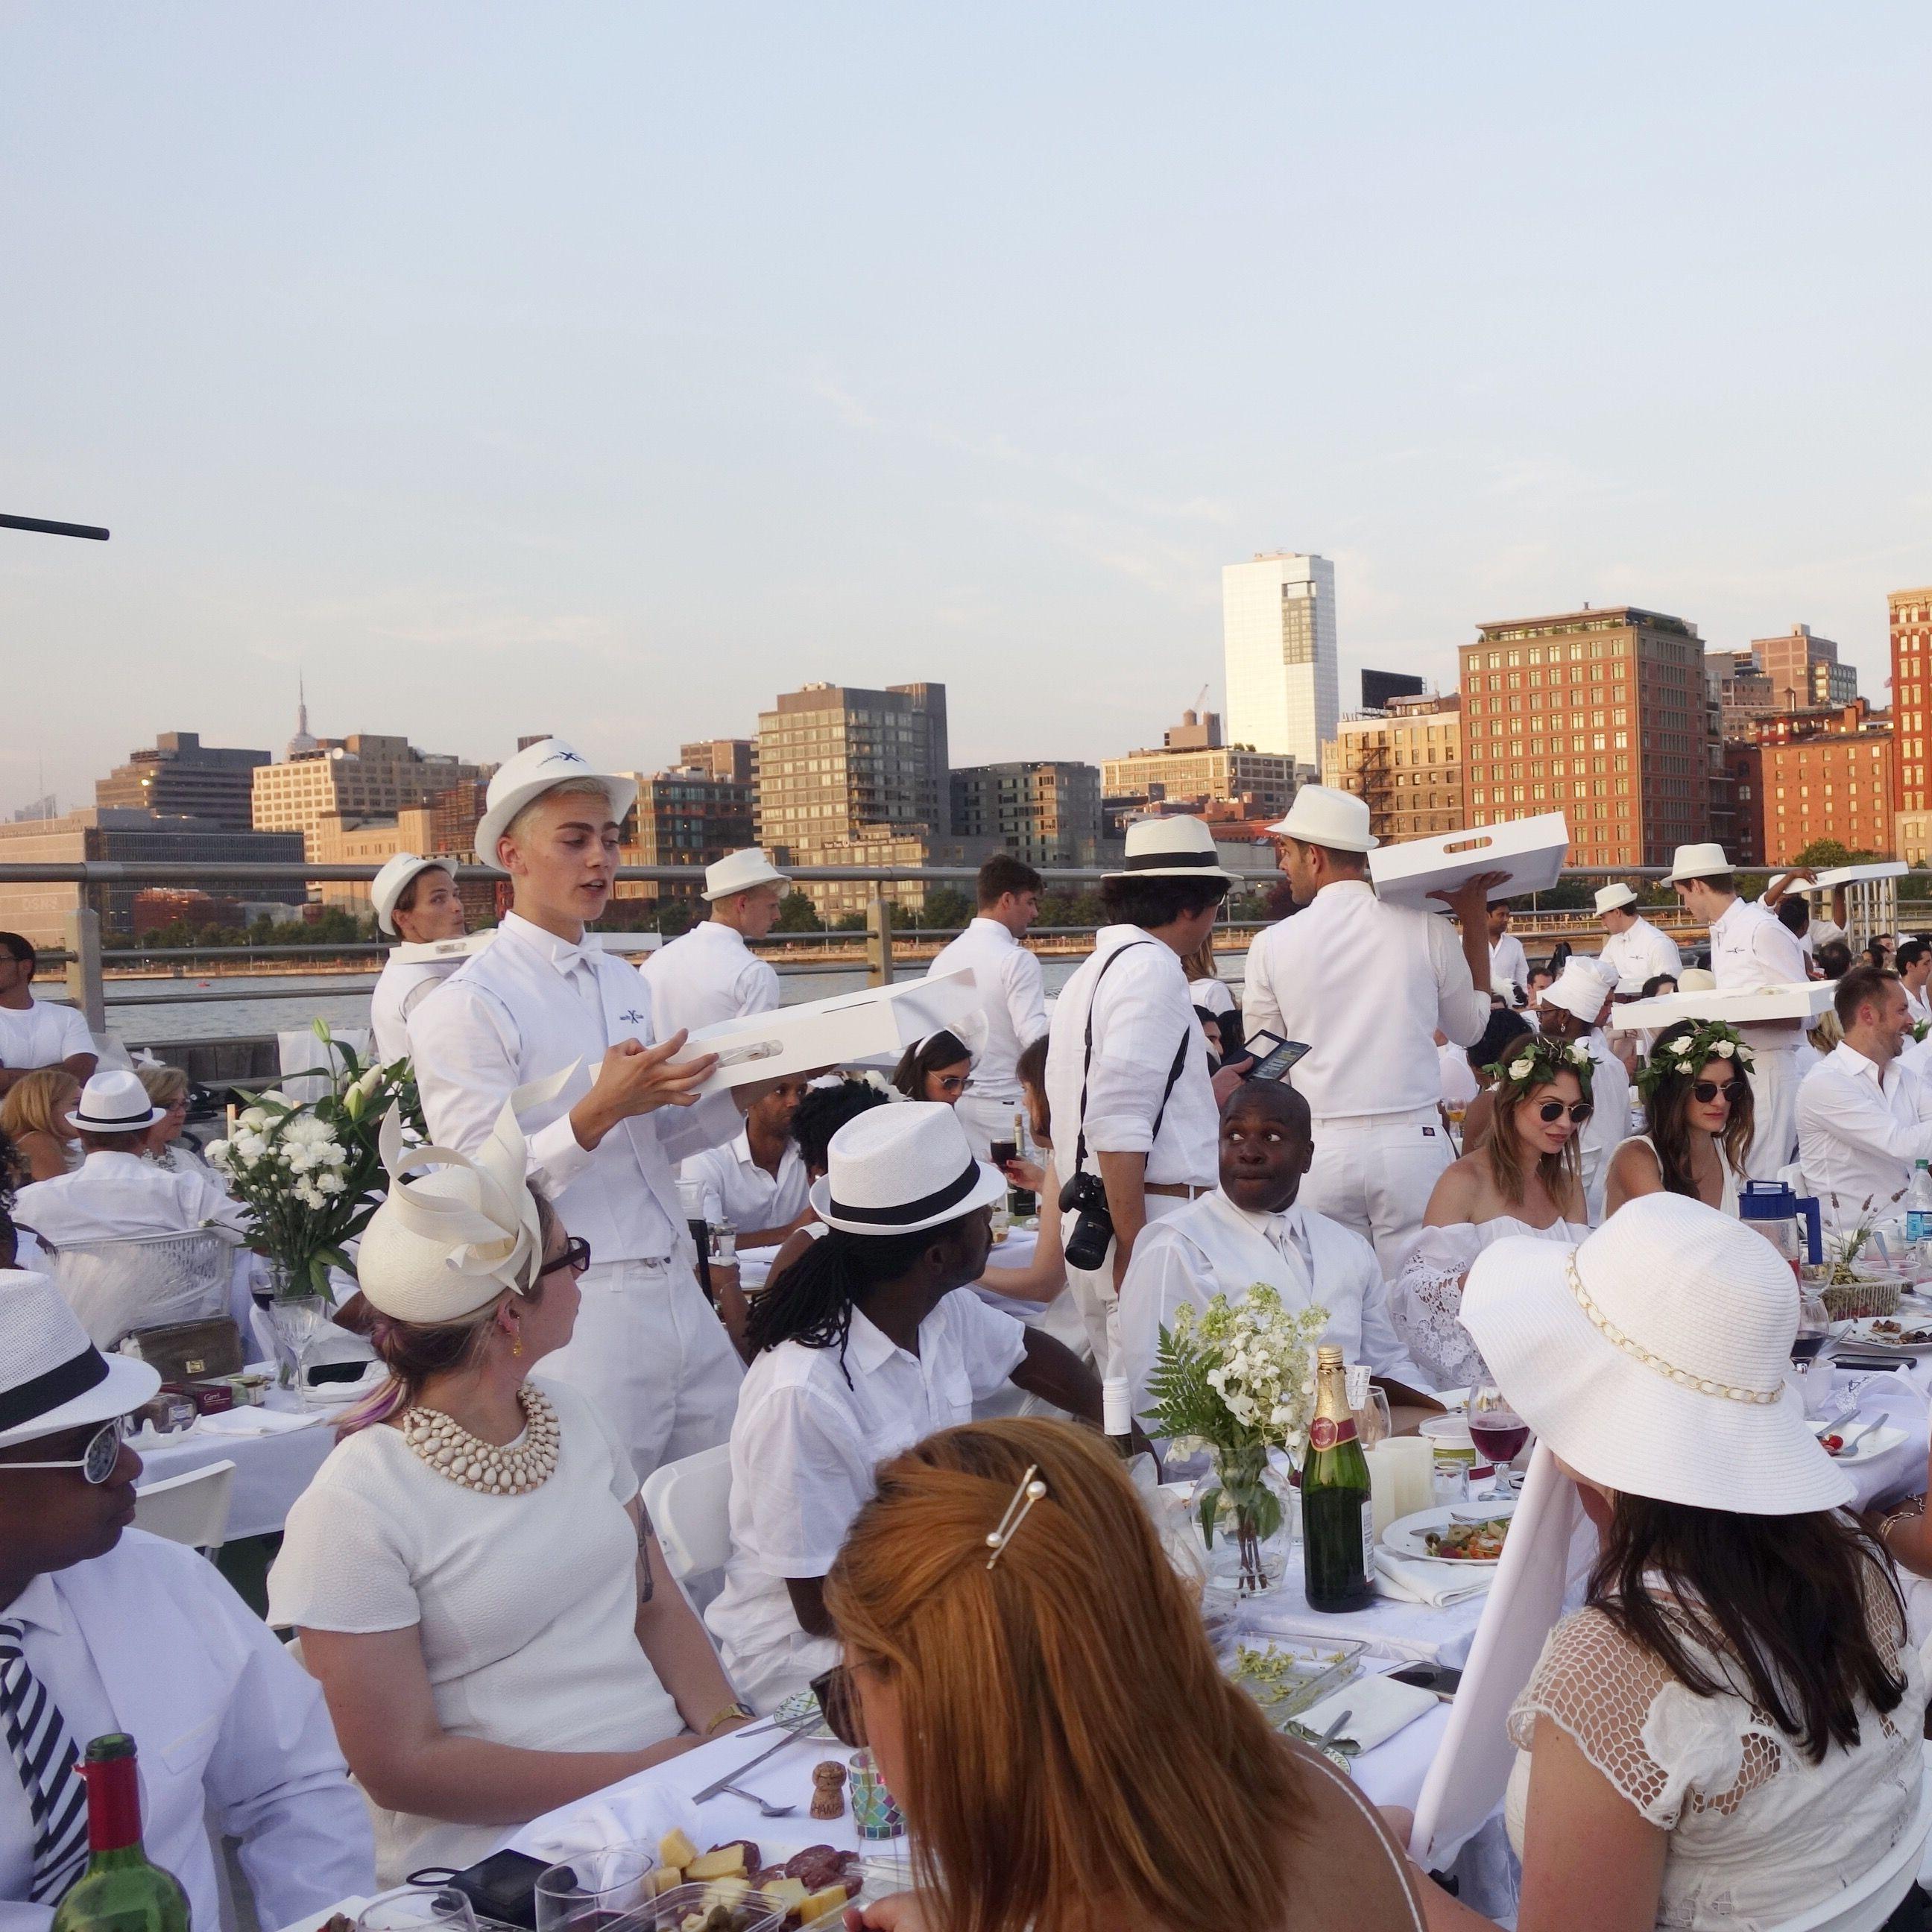 Diner en Blanc NYC 2015 | Diner en blanc nyc, Diner en